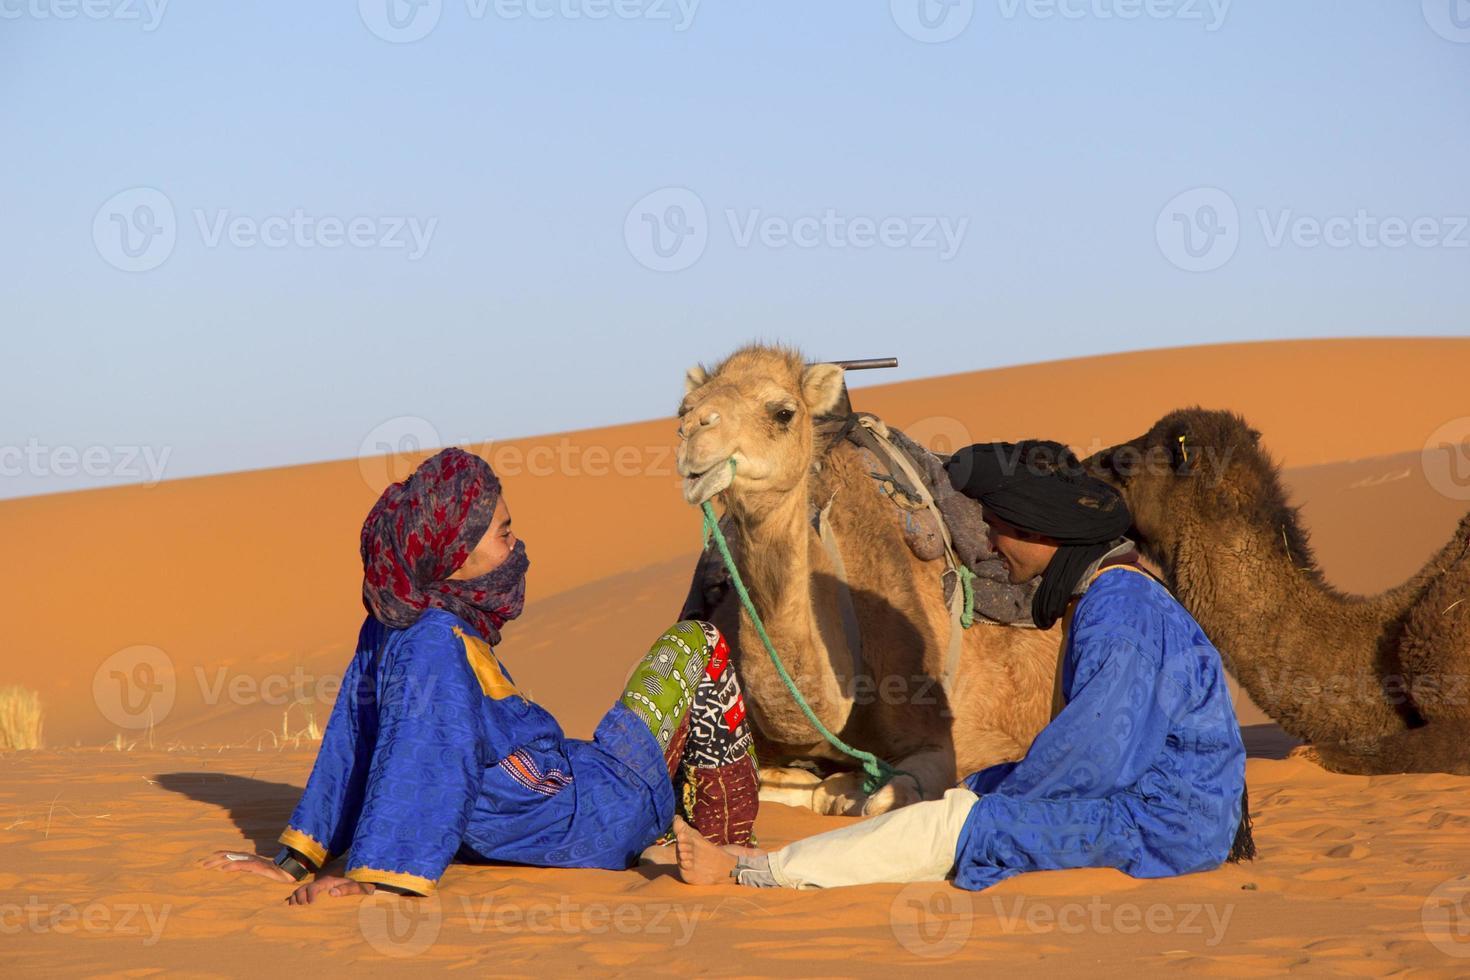 Desert and bedouins photo